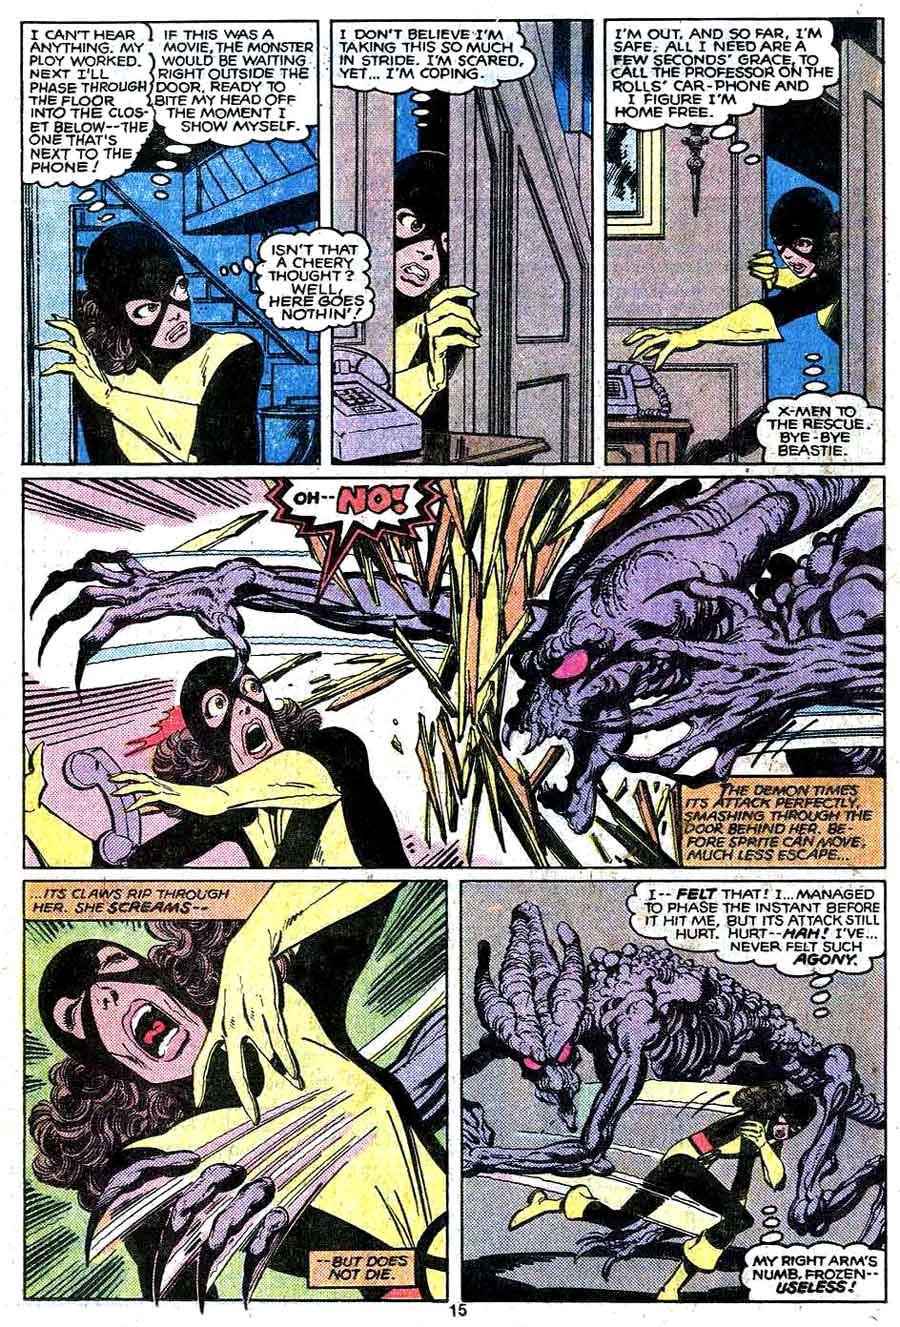 X-men v1 #143 marvel comic book page art by John Byrne